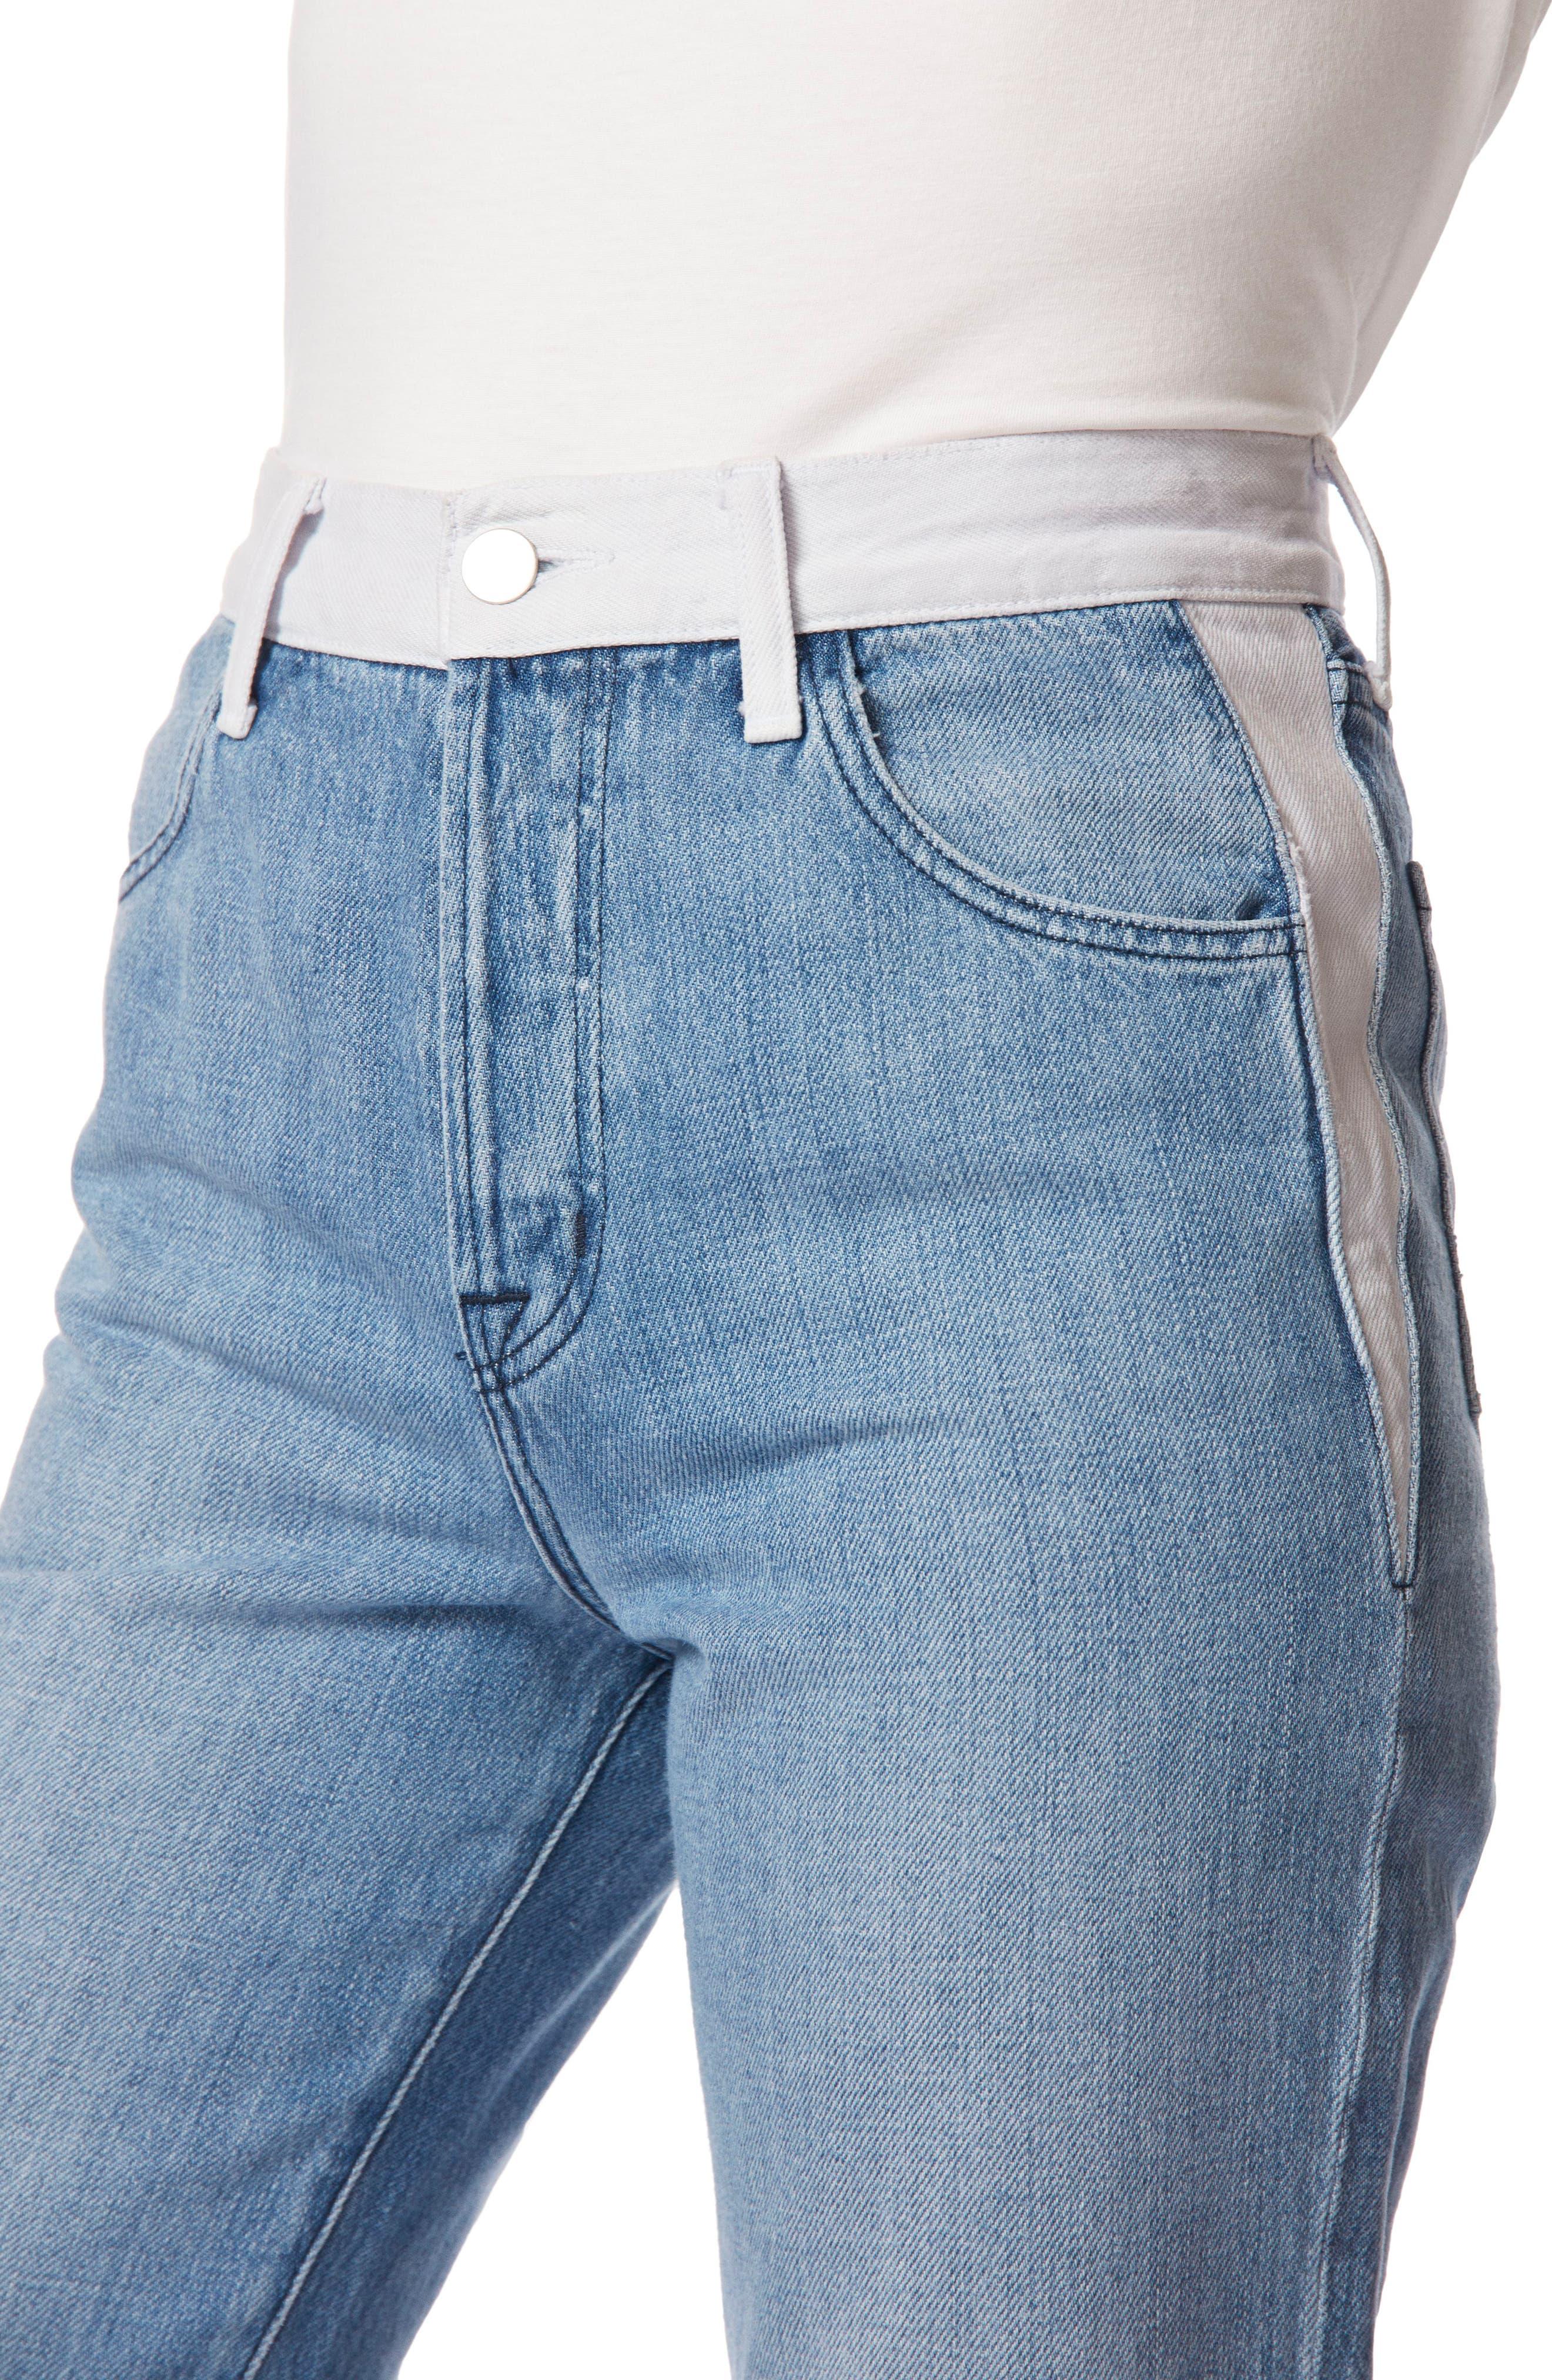 Wynne High Waist Crop Straight Leg Jeans,                             Alternate thumbnail 5, color,                             450